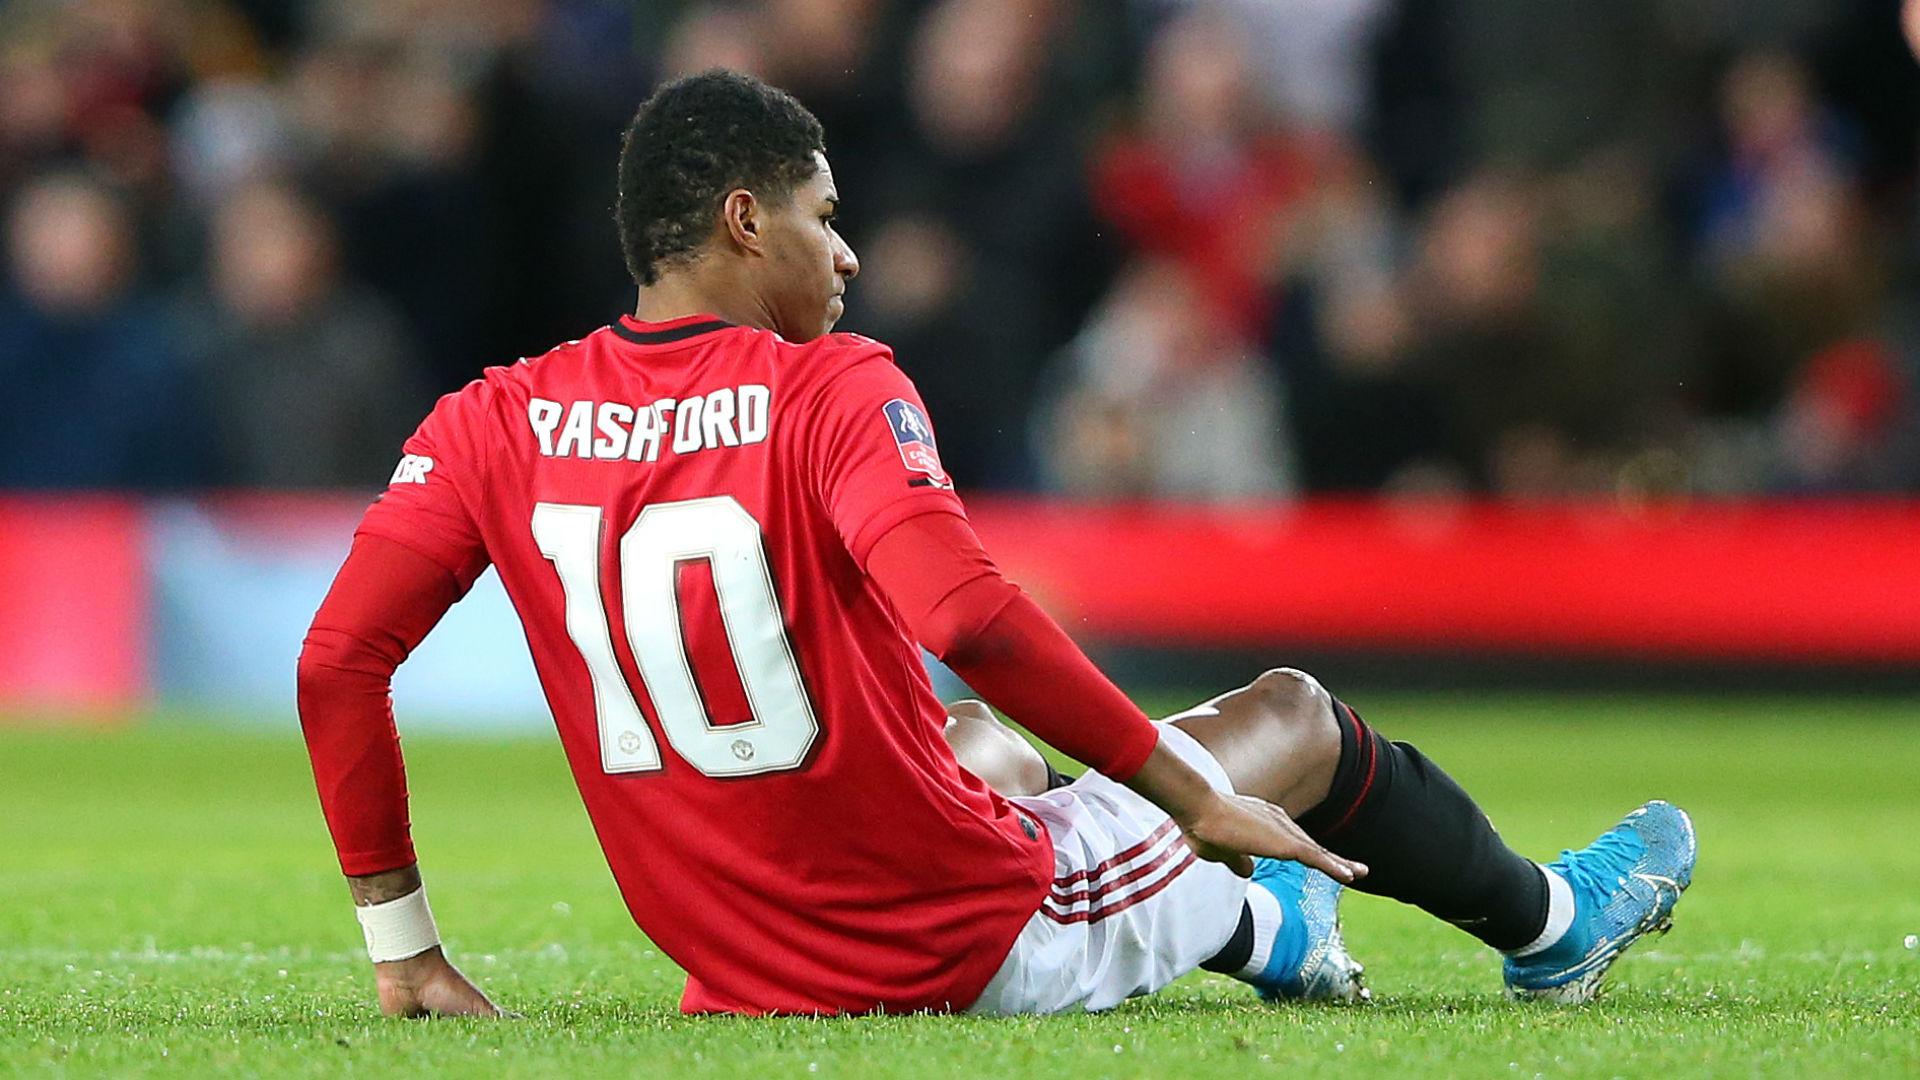 Man Utd will 'do everything' to get Rashford fit for Liverpool - Solskjaer